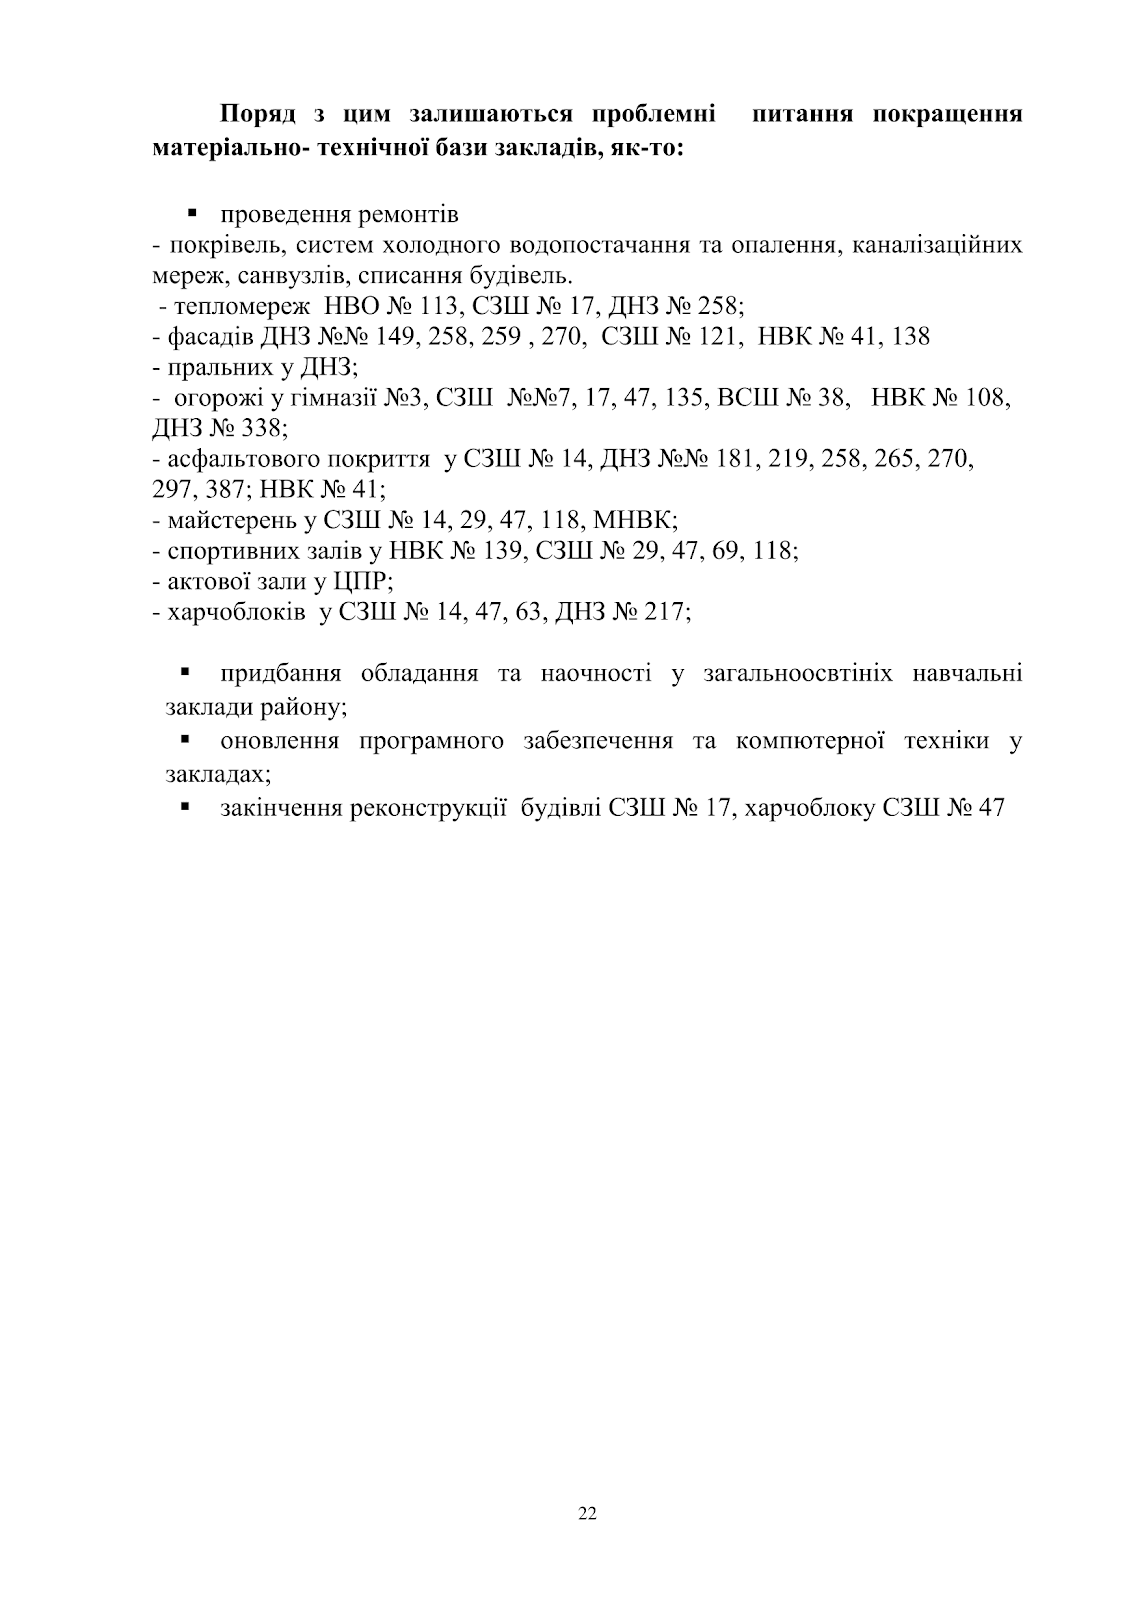 C:\Users\Валерия\Desktop\план 2016 рік\план 2016 рік-022.png